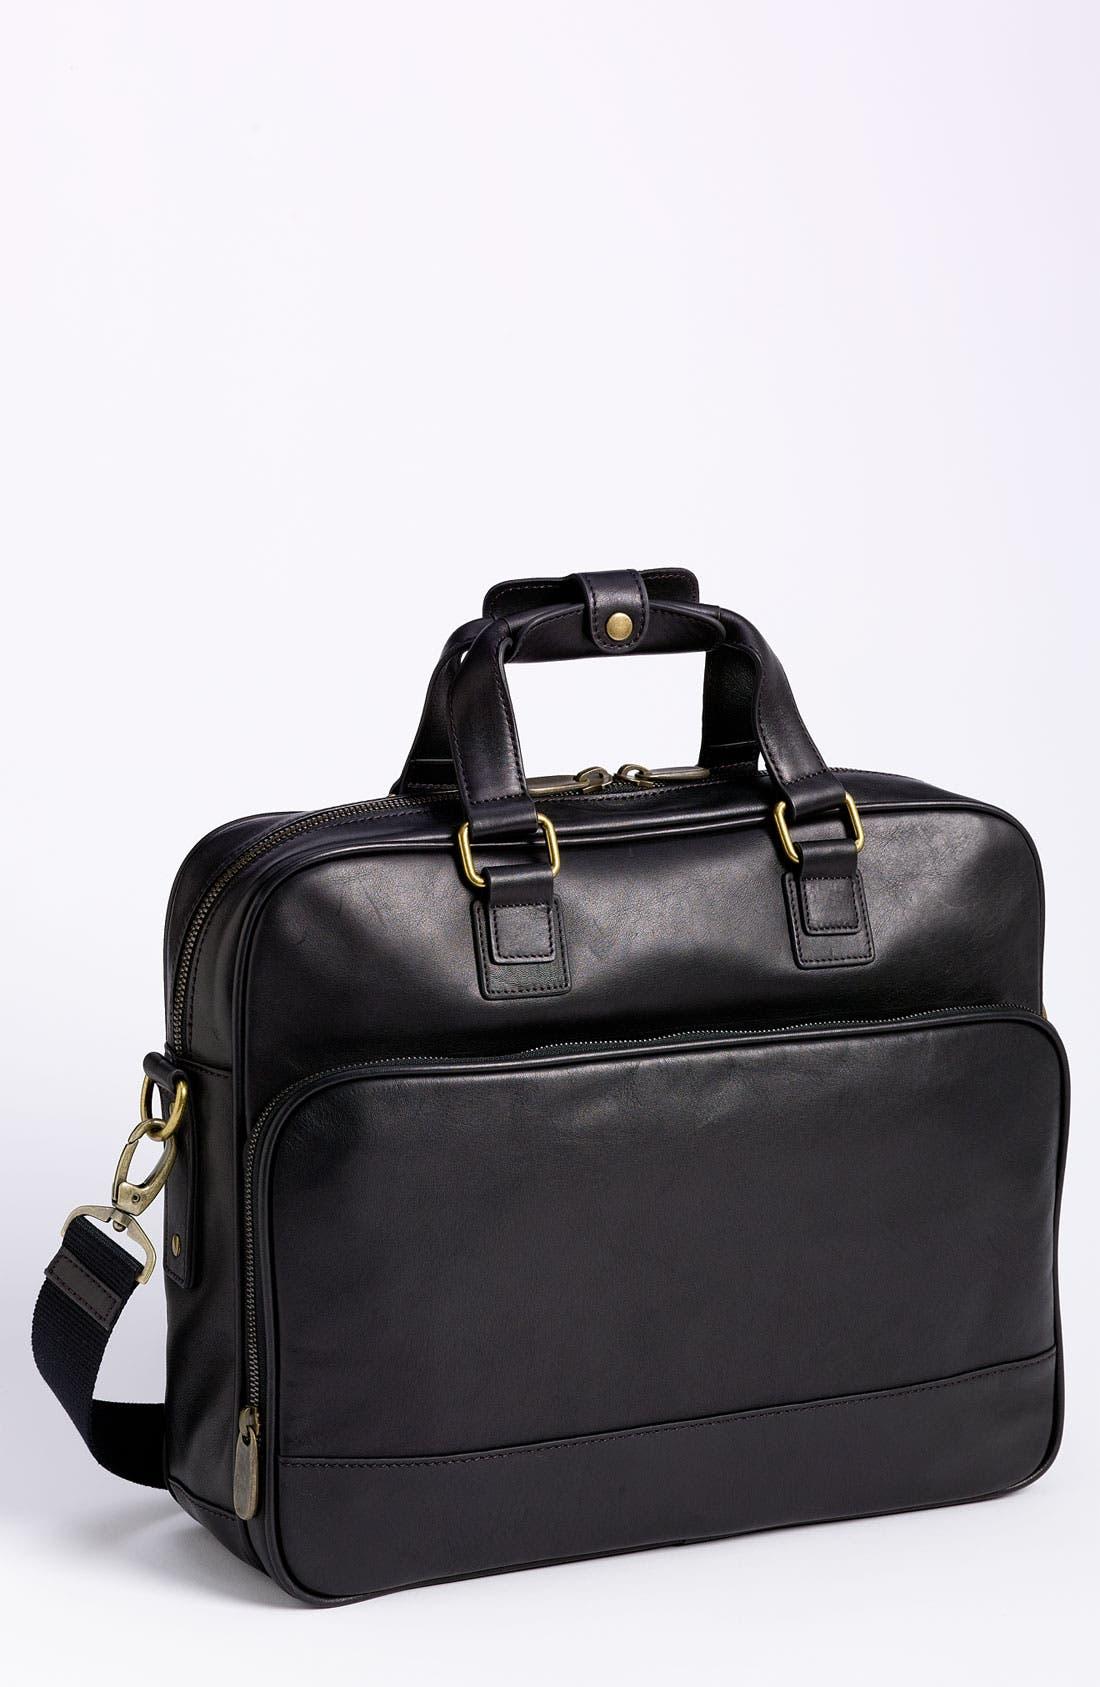 Top Zip Leather Briefcase,                             Main thumbnail 1, color,                             Black